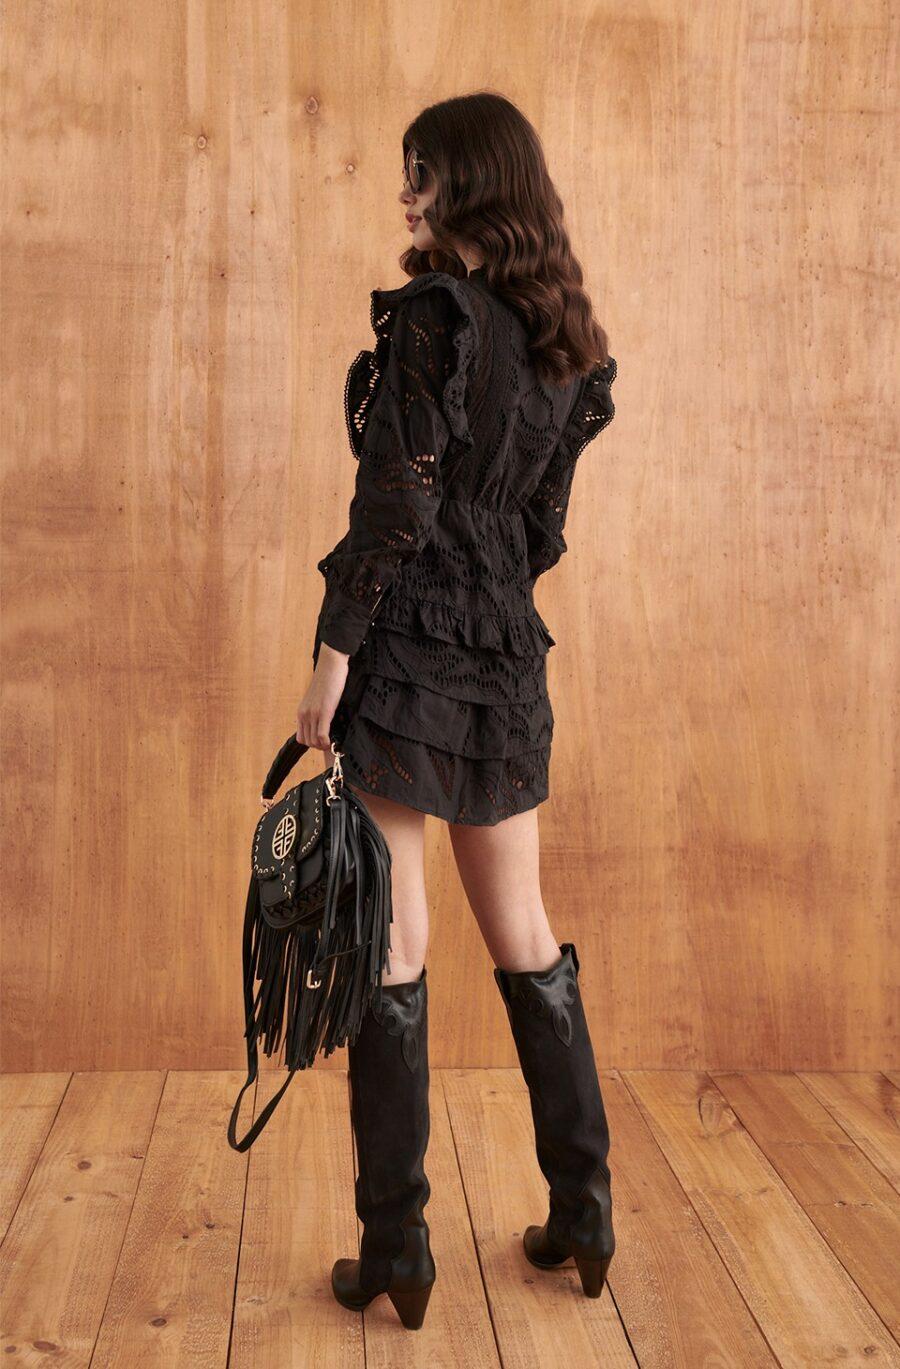 <ul> <li>Vestido de la marca Fetiche de color negro con bordados trquelados al tono</li> <li>Detalle de volantes en las mangas</li> <li>Cintura elástica</li> <li>Falda asimétrica con varias capas de volantes</li> <li>Con forro en el interior</li> <li>100% Algodón</li> </ul> Alabama Shop